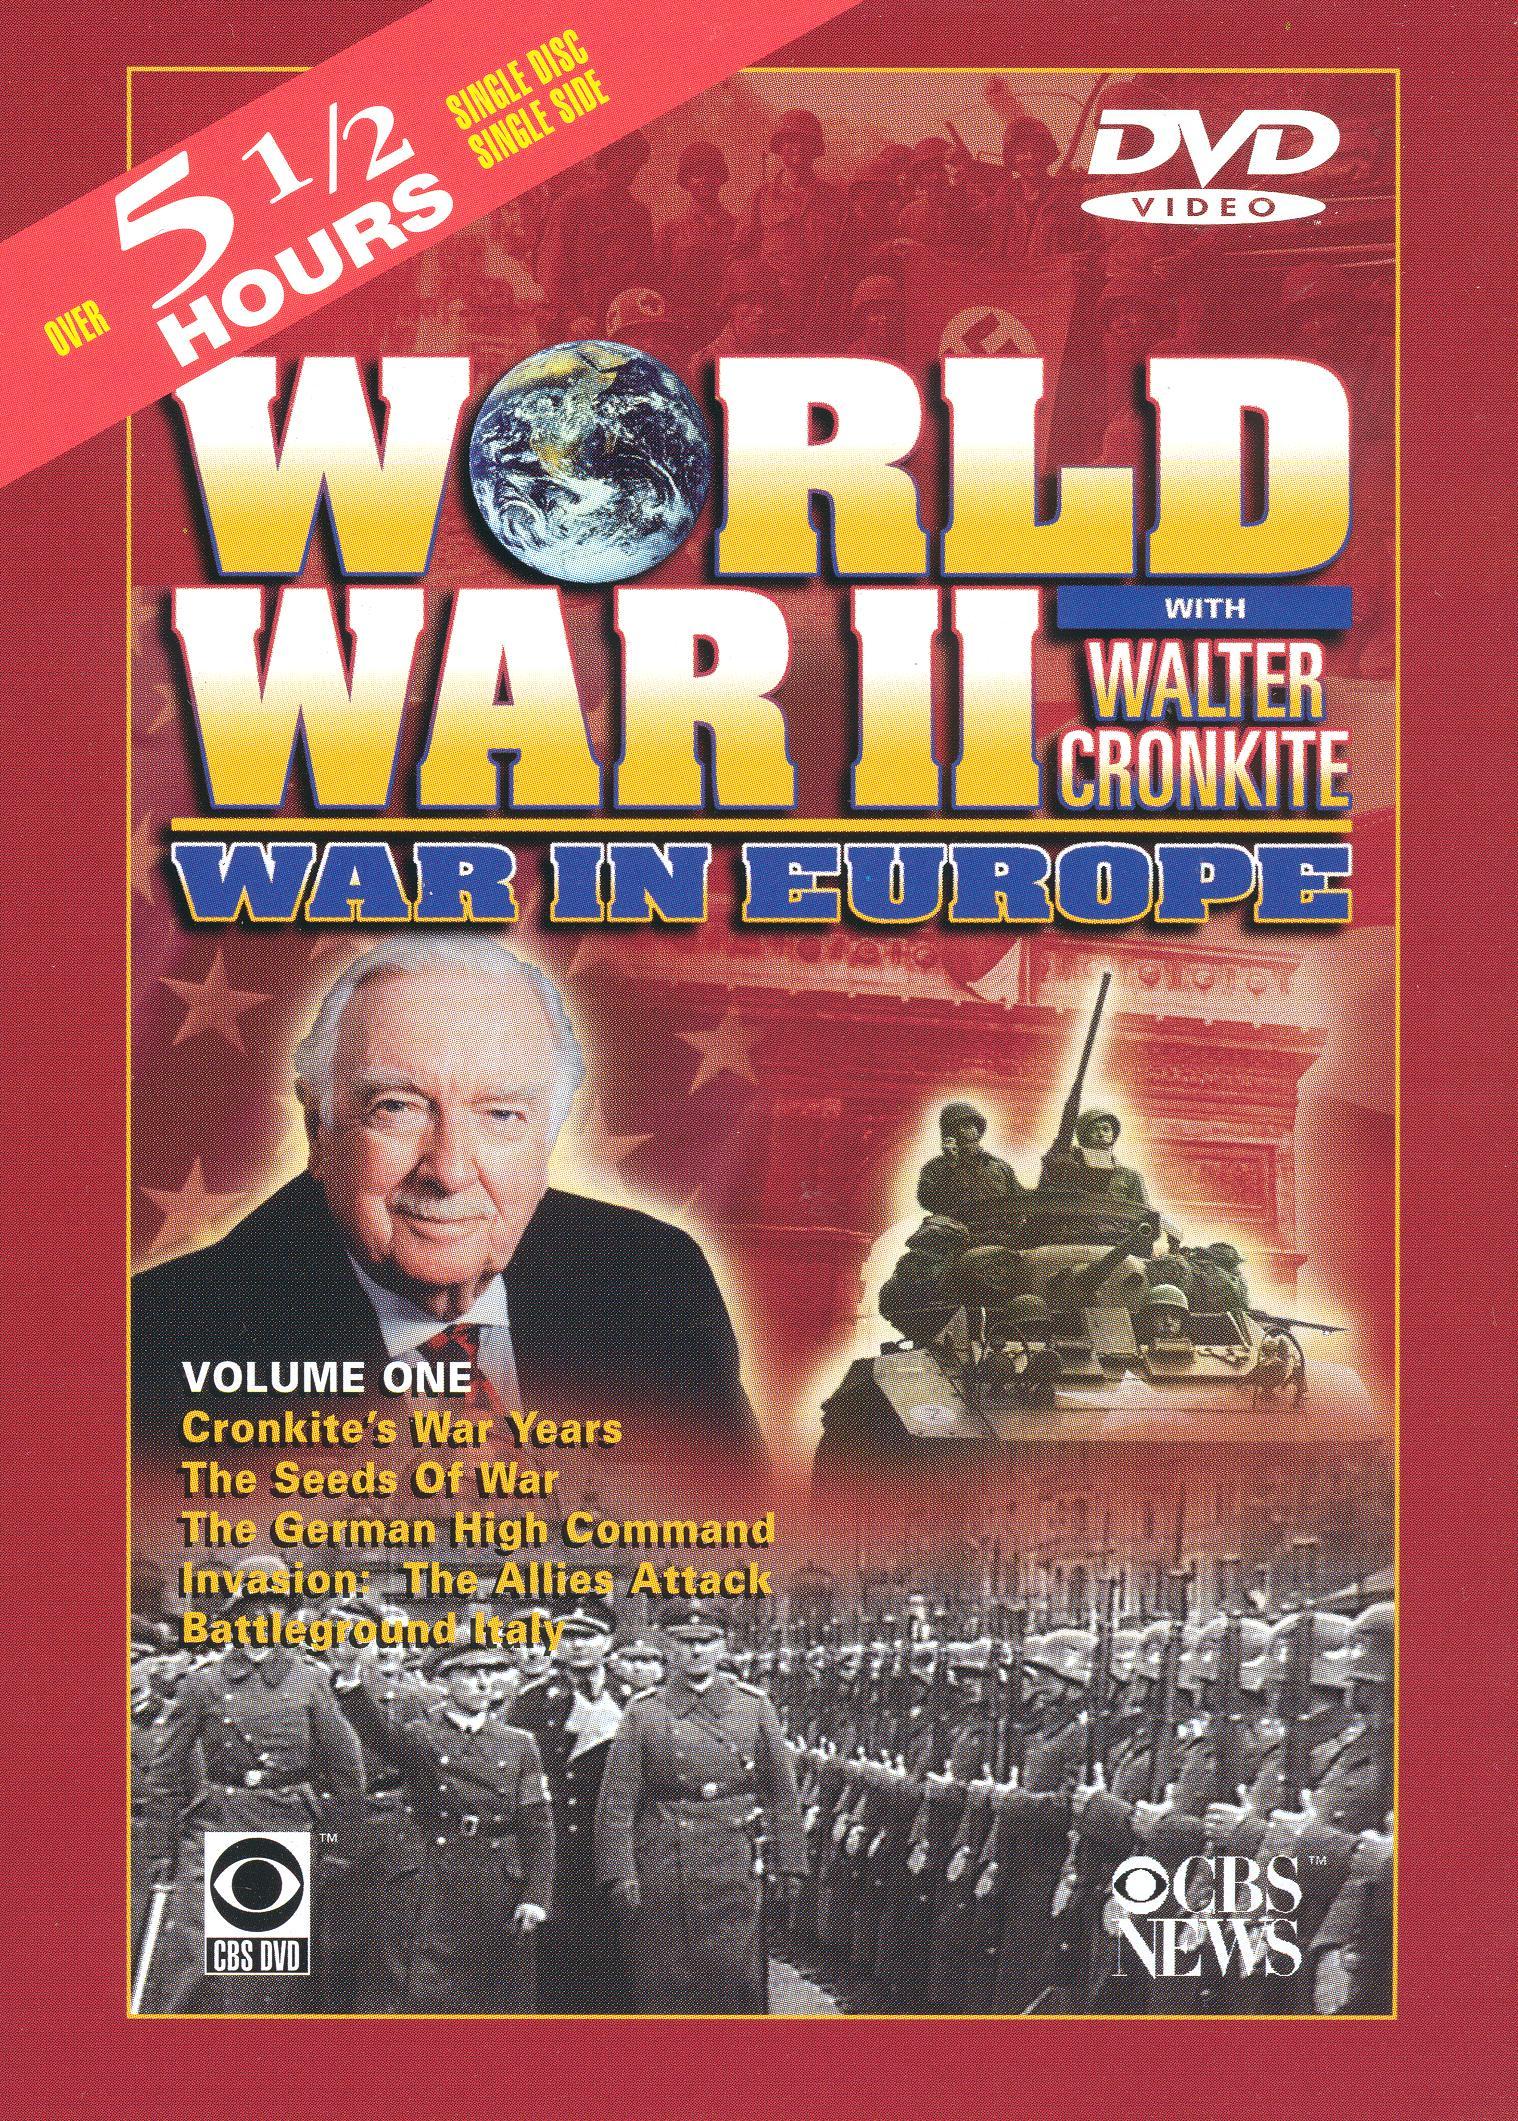 World War II With Walter Cronkite: War in Europe, Vol. 1